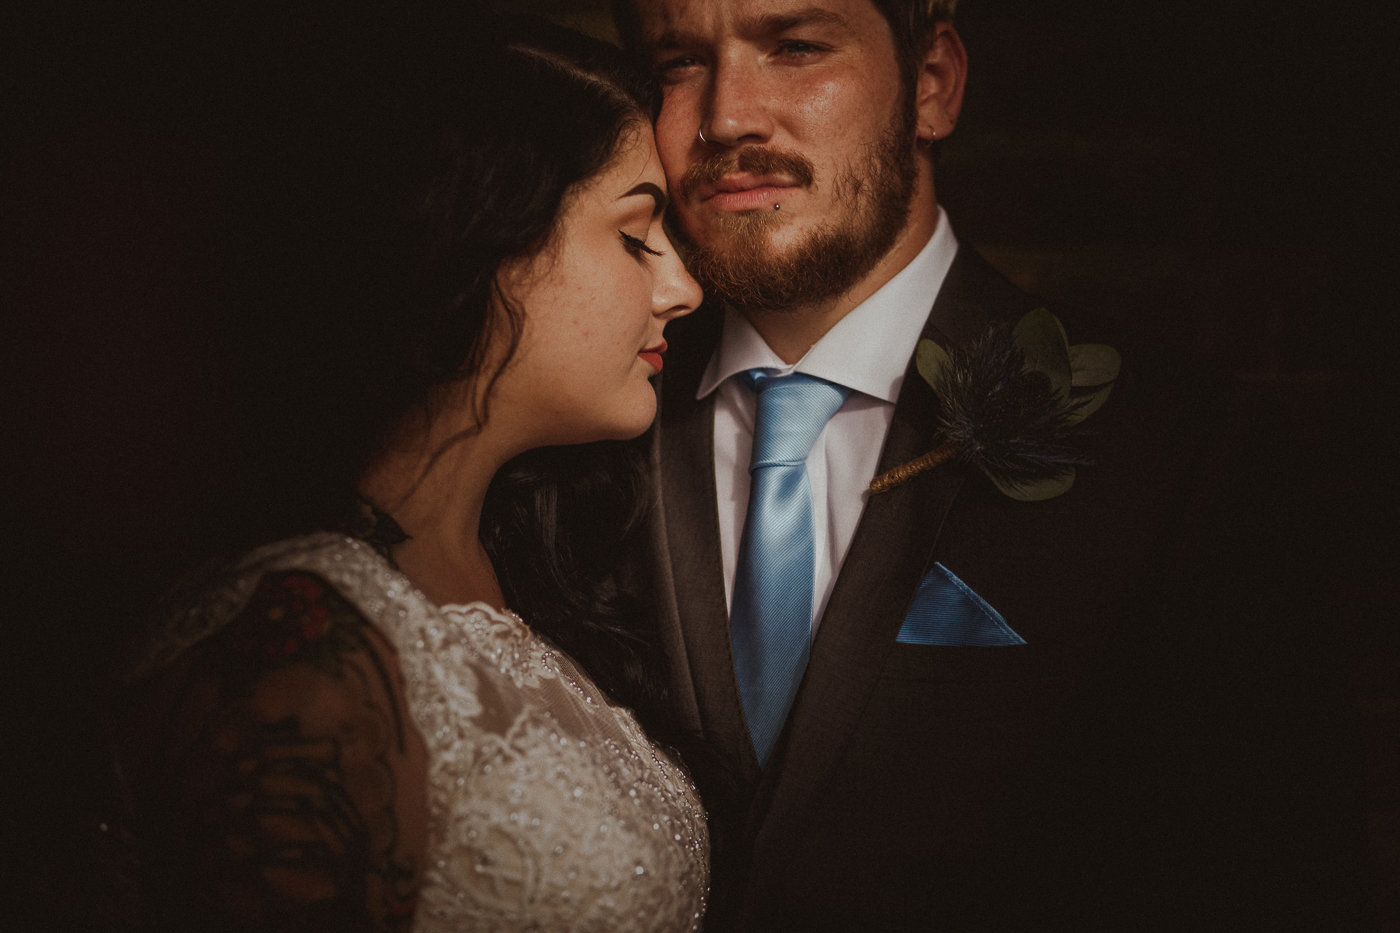 berkshire-wedding-photographer-25.jpg